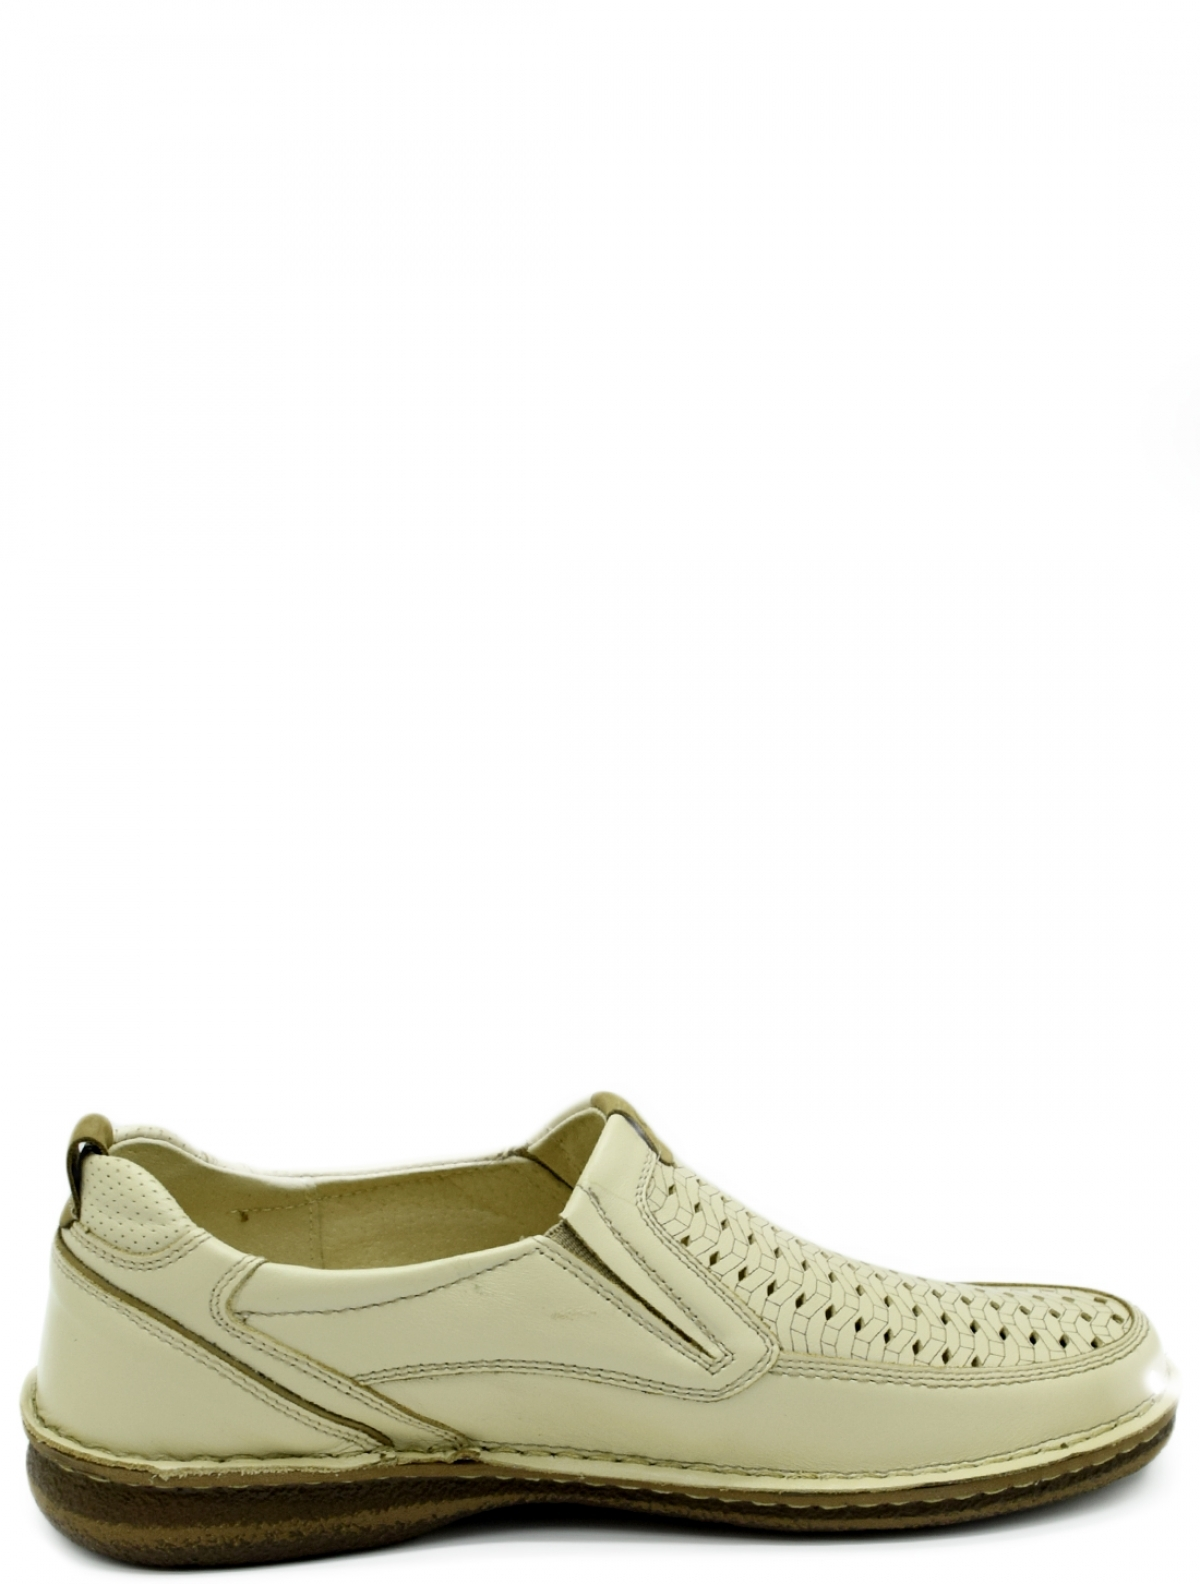 LEGRE 491.434.318.695 мужские туфли